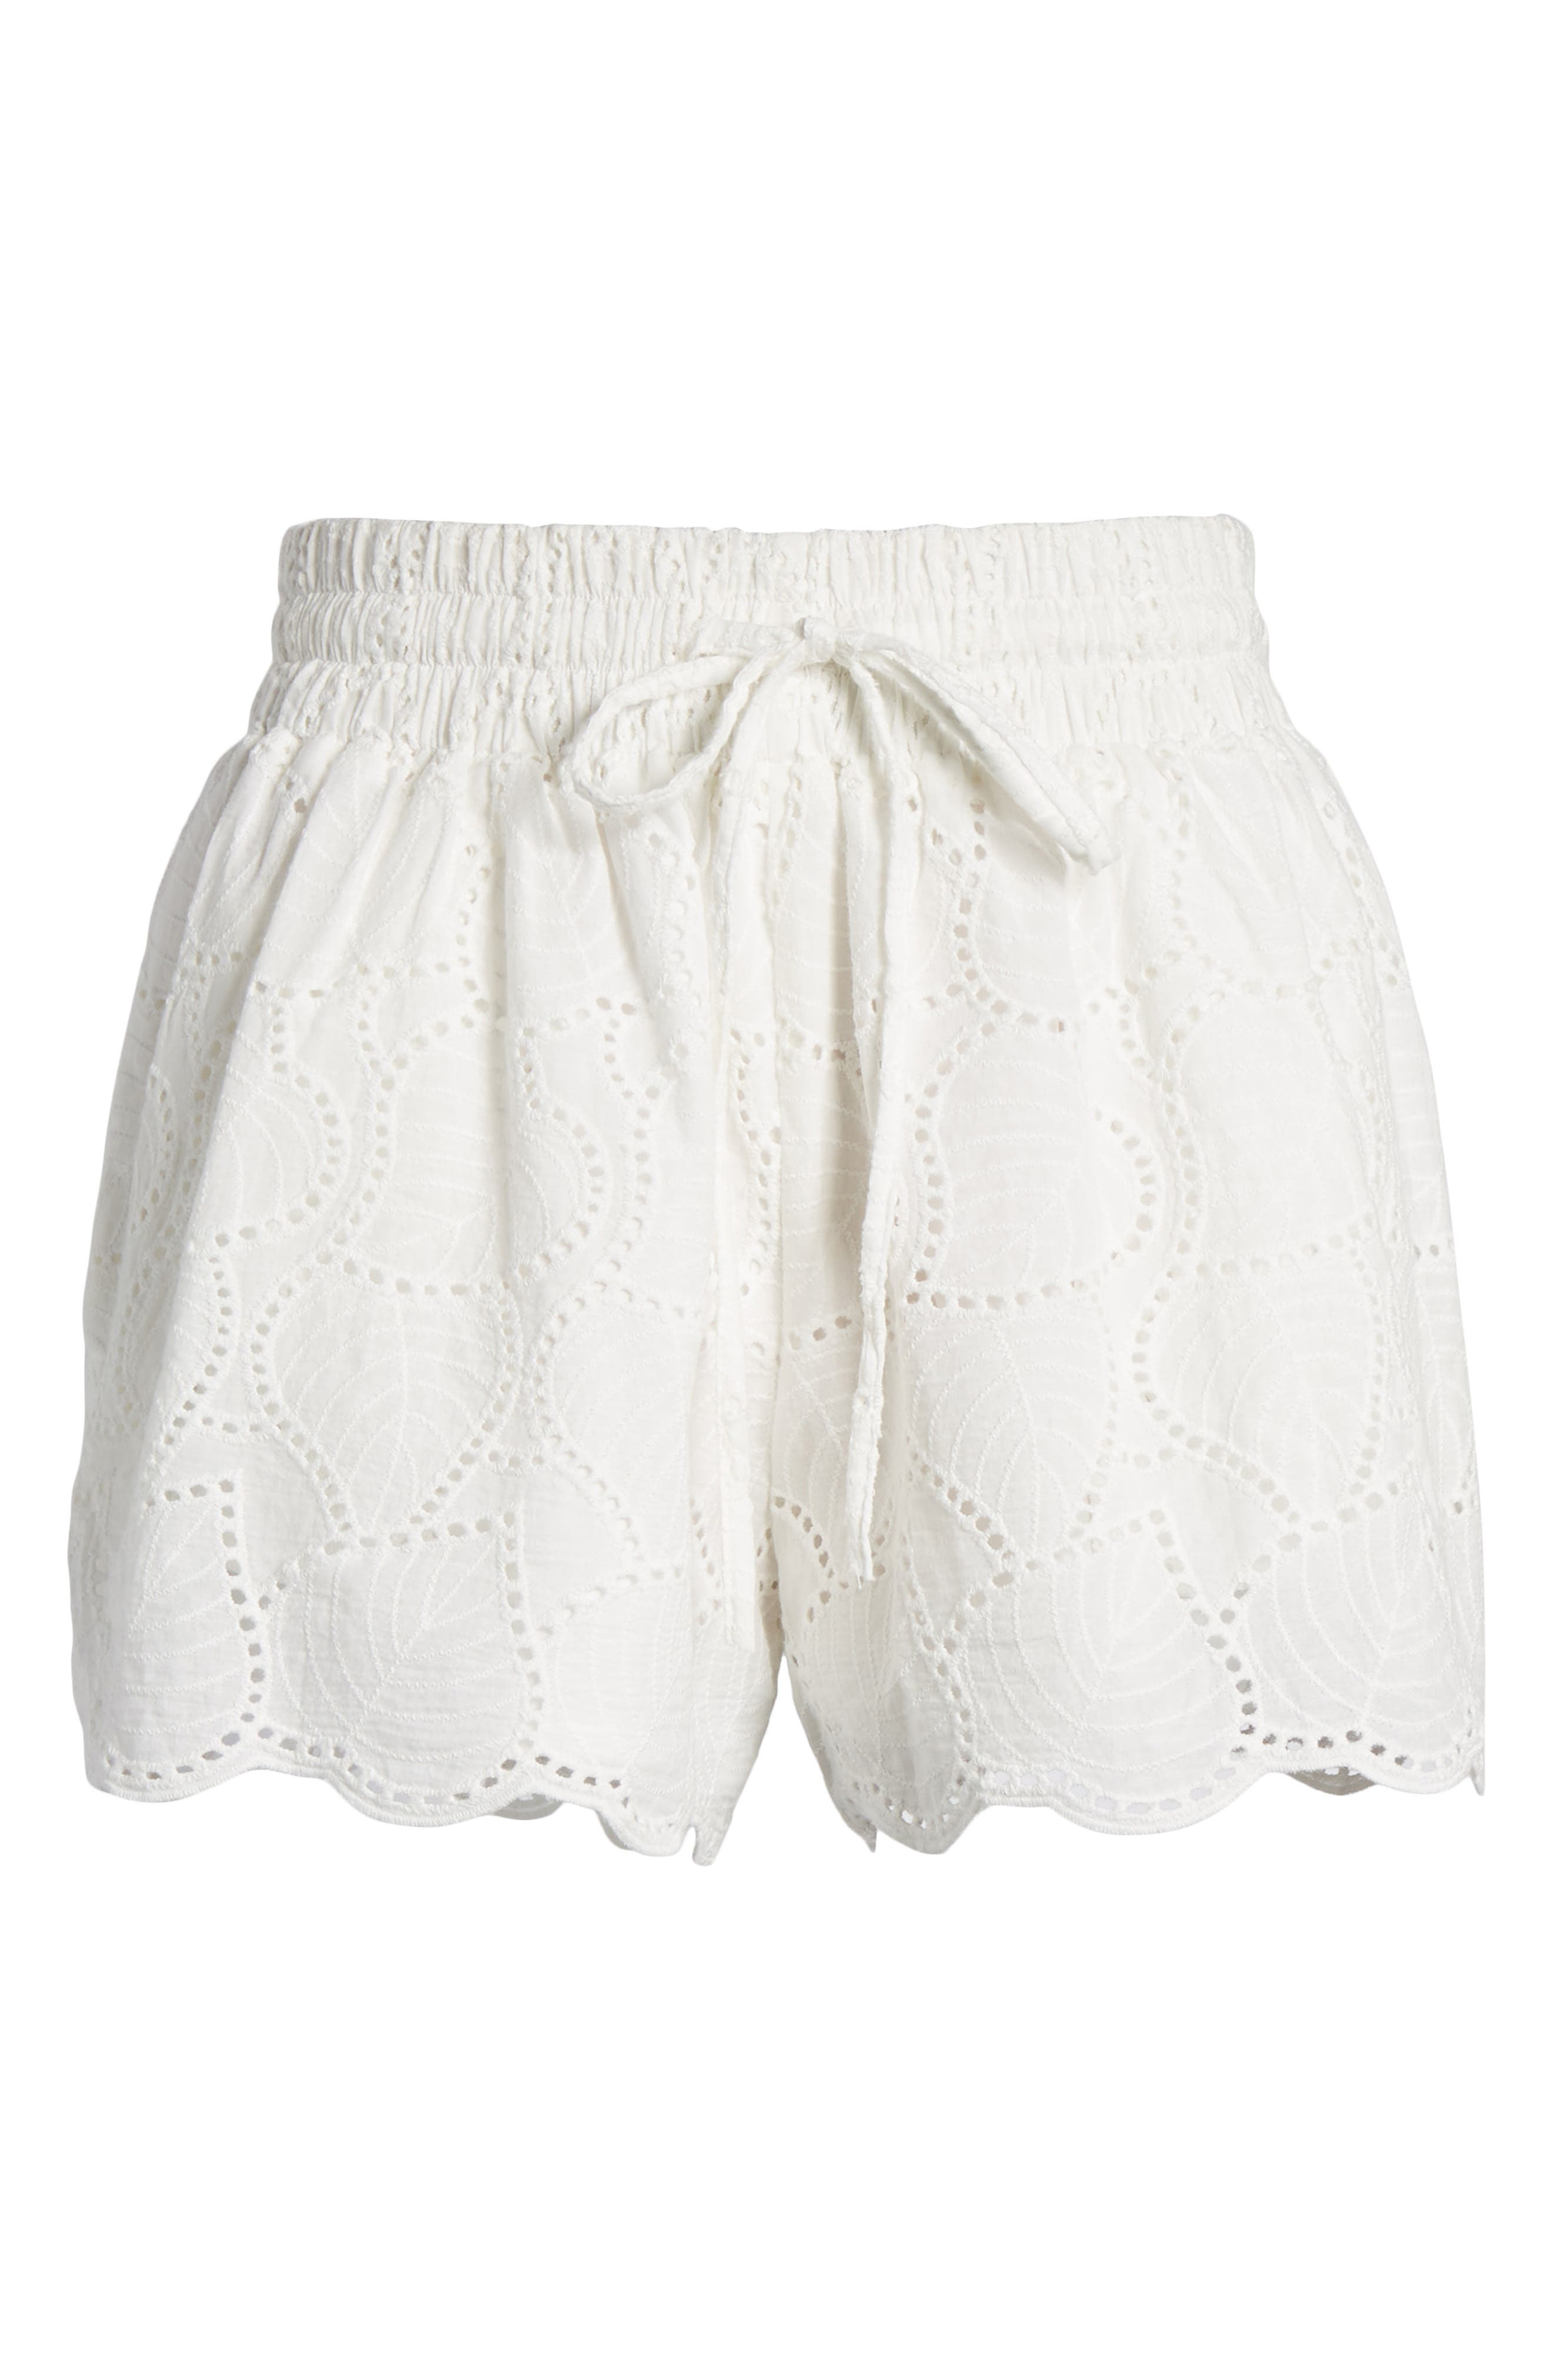 Bishop + Young Eyelet Shorts,                             Alternate thumbnail 6, color,                             White